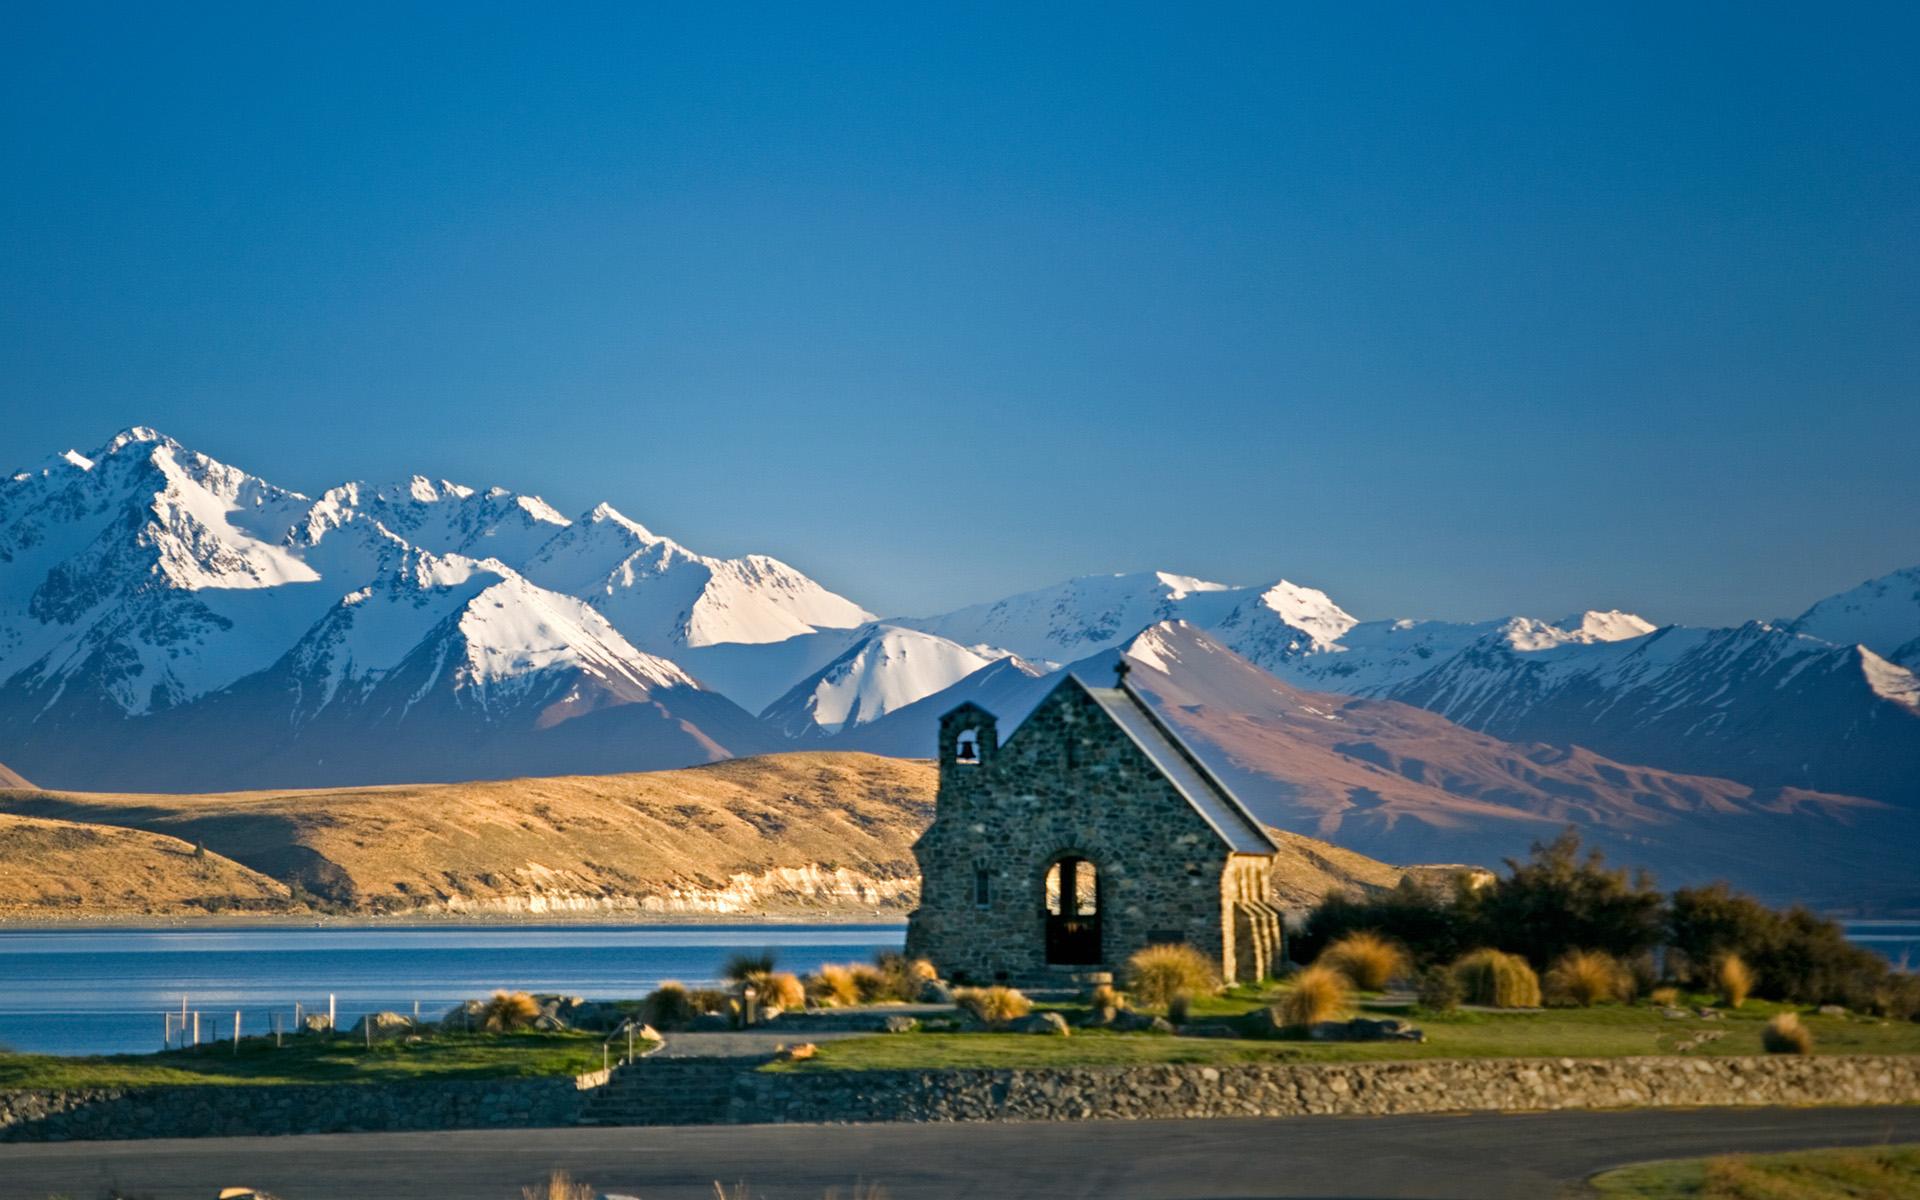 Lake Tekapo Scenery New Zealand Wallpaper is a hi res Wallpaper 1920x1200